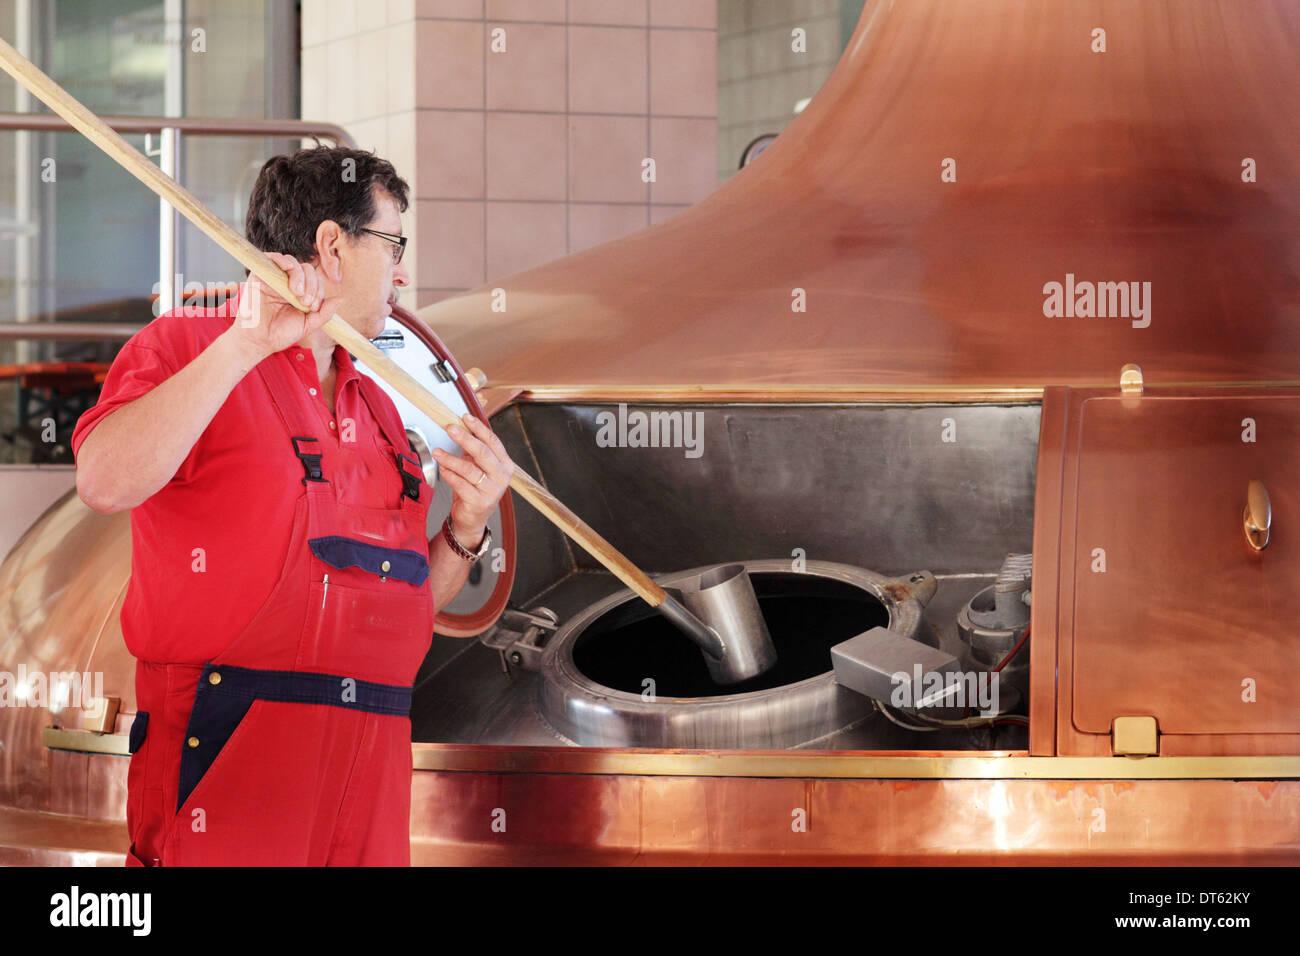 Man stirring vat in brewery - Stock Image